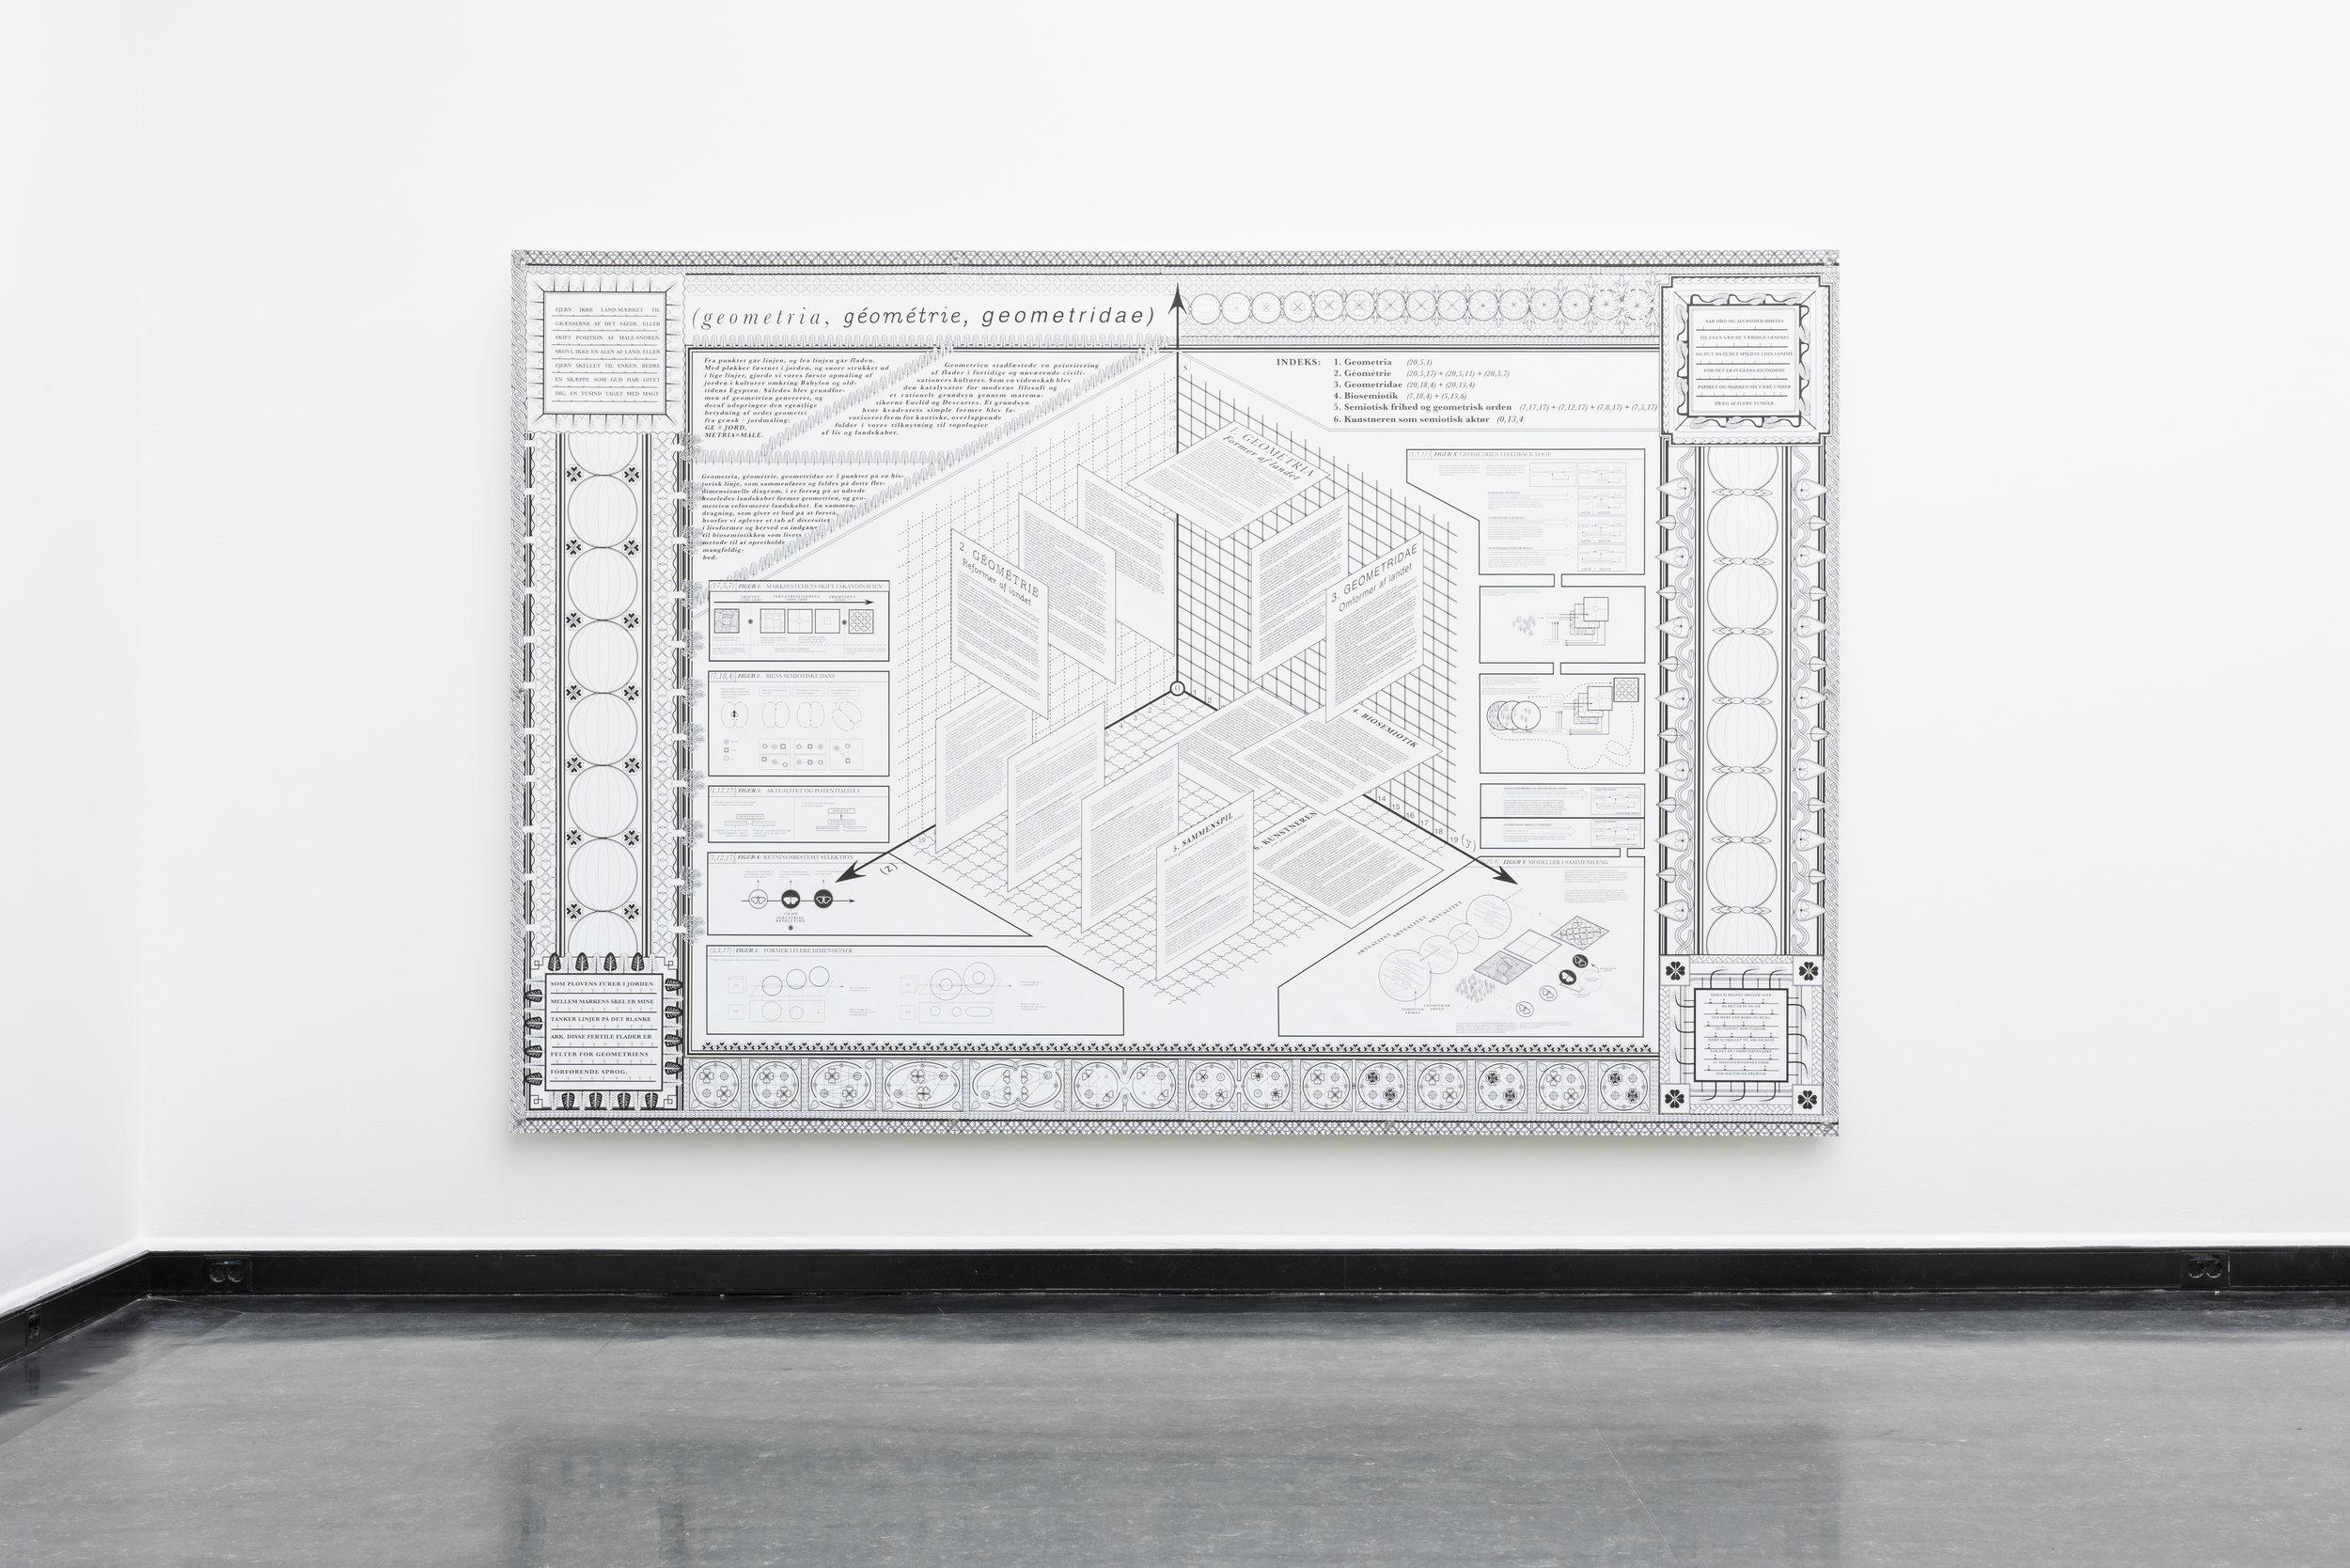 idsel Bonde,  geometria, géométrie, geometridae . Foto: Jane Sverdrupsen